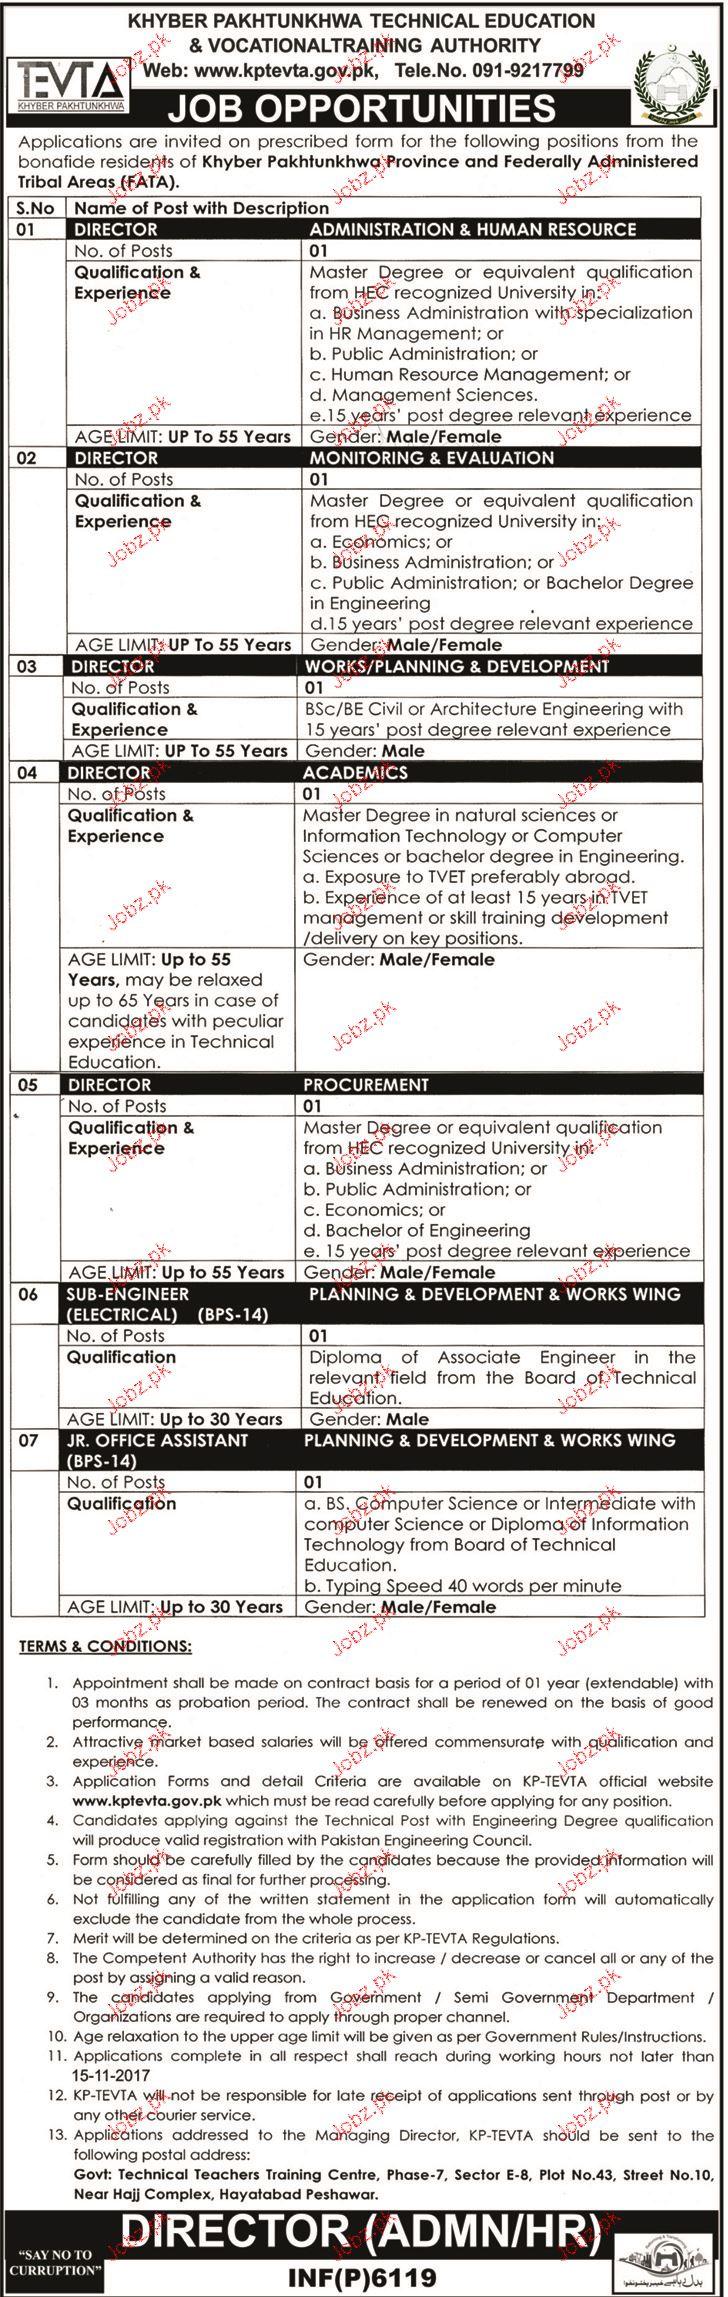 KPK Technical Education and Vocational Authority KTEVTA Jobs